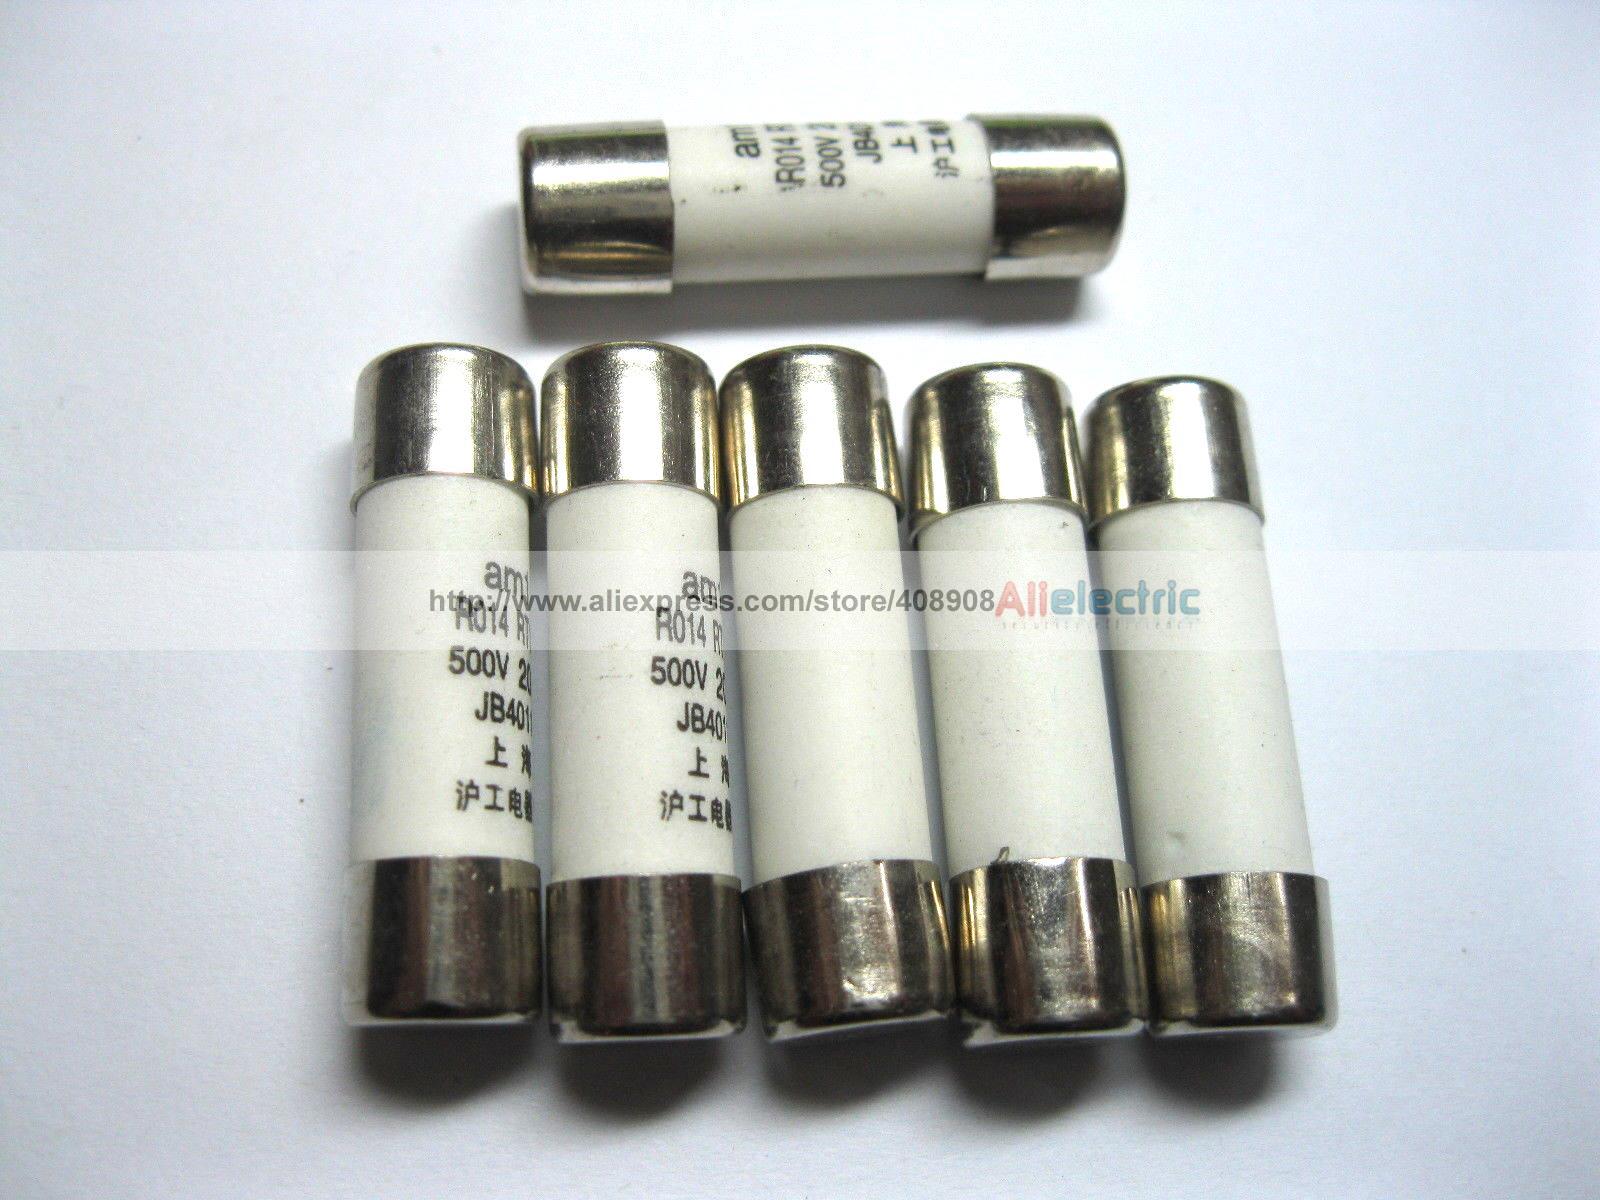 50 Pcs Ceramic Fuses 2A 500V 8.5mm x 31.5mm 1000 pcs fast blow glass fuses 3 15a 250v 5mm x 20mm